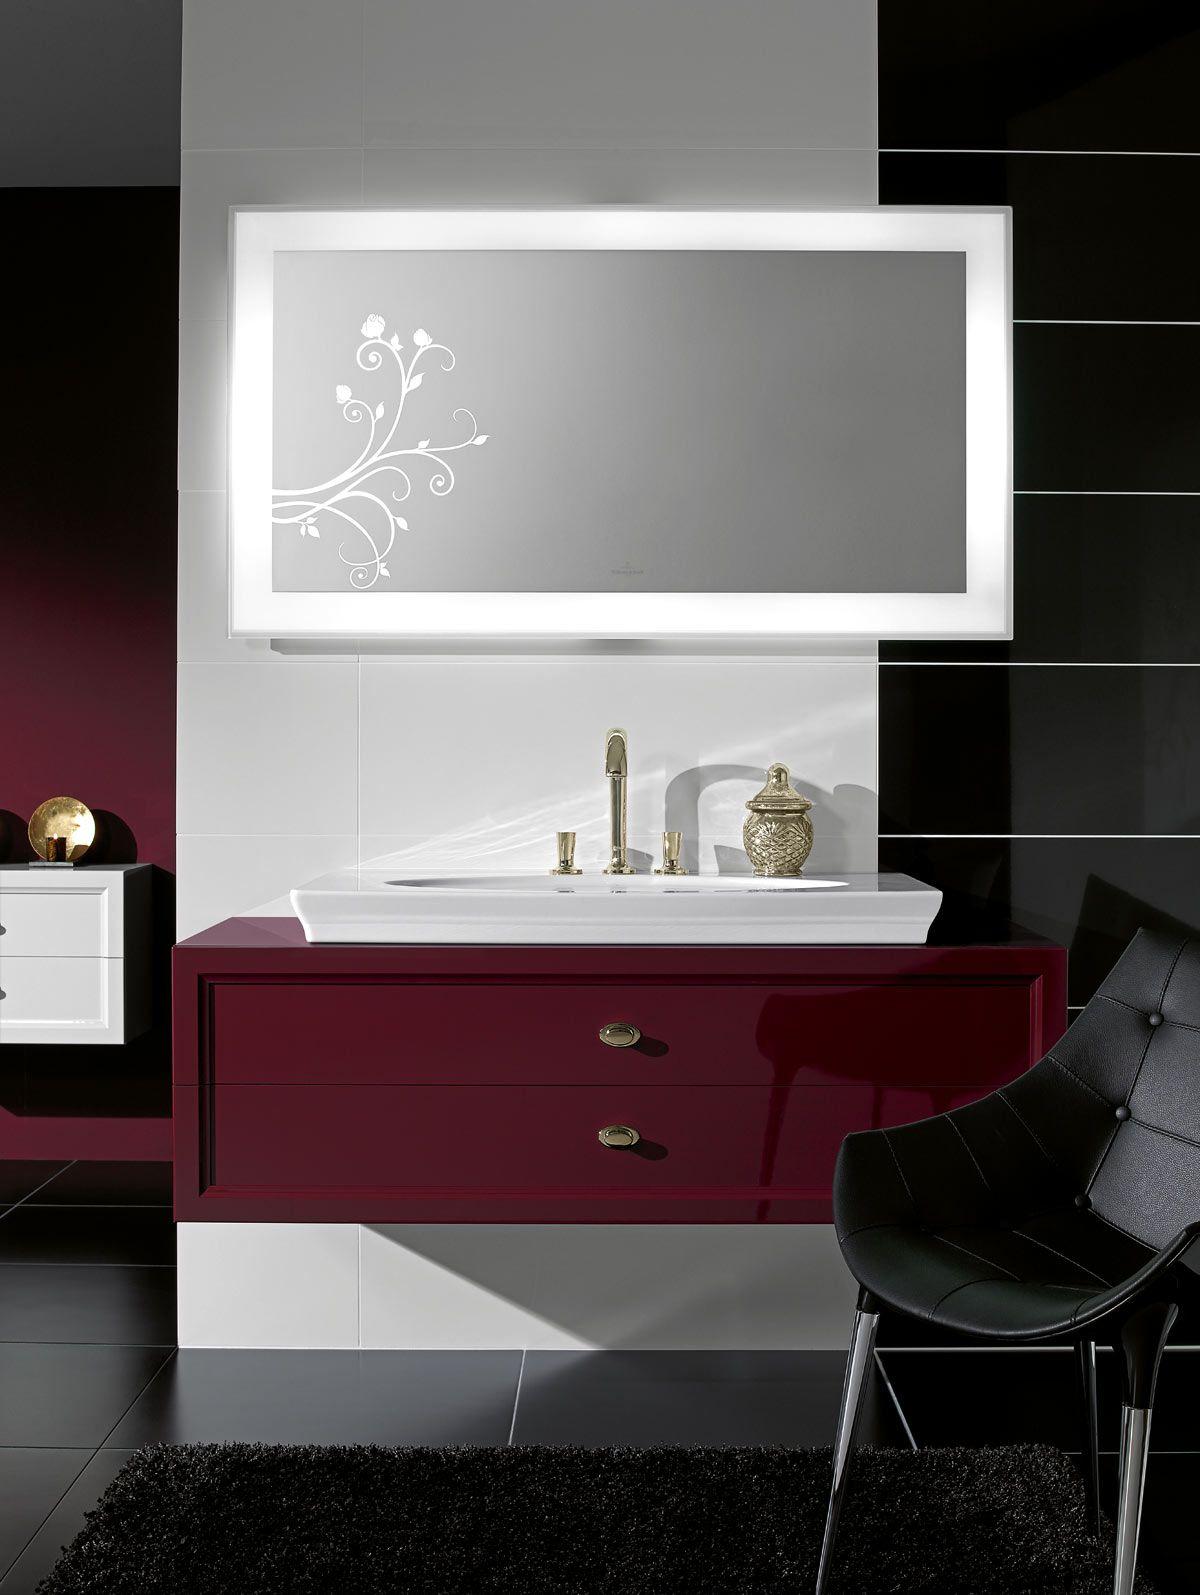 Villeroy Amp Boch La Belle Furniture In Framboise Glaze Villeroy Amp Boch Furniture Bathroom Colors Purple Bathrooms Bathroom